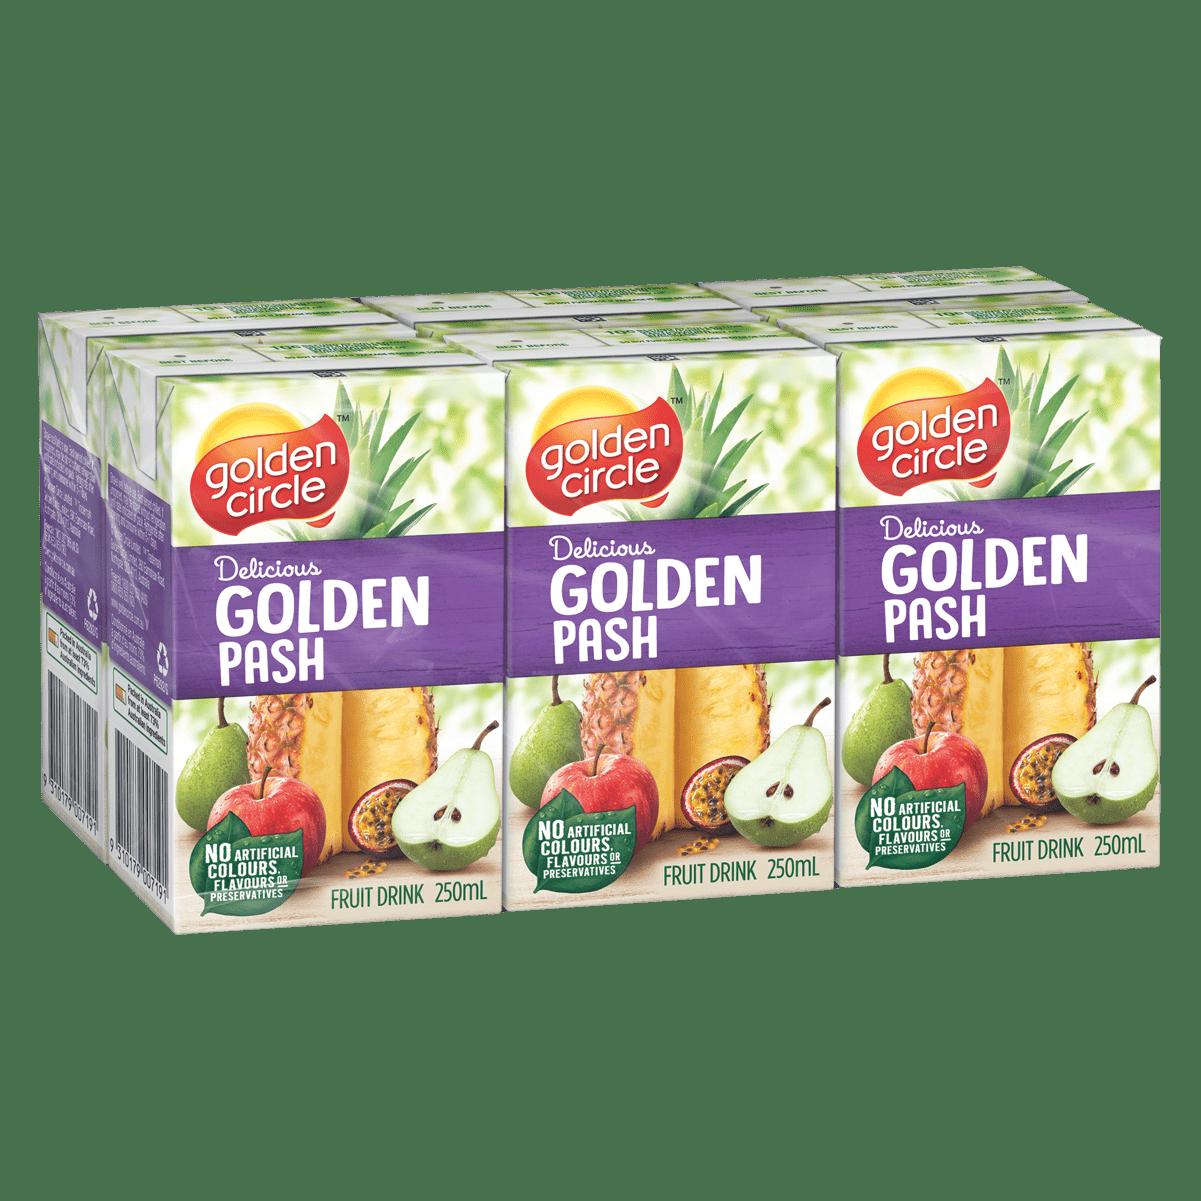 Golden Pash 6pk image